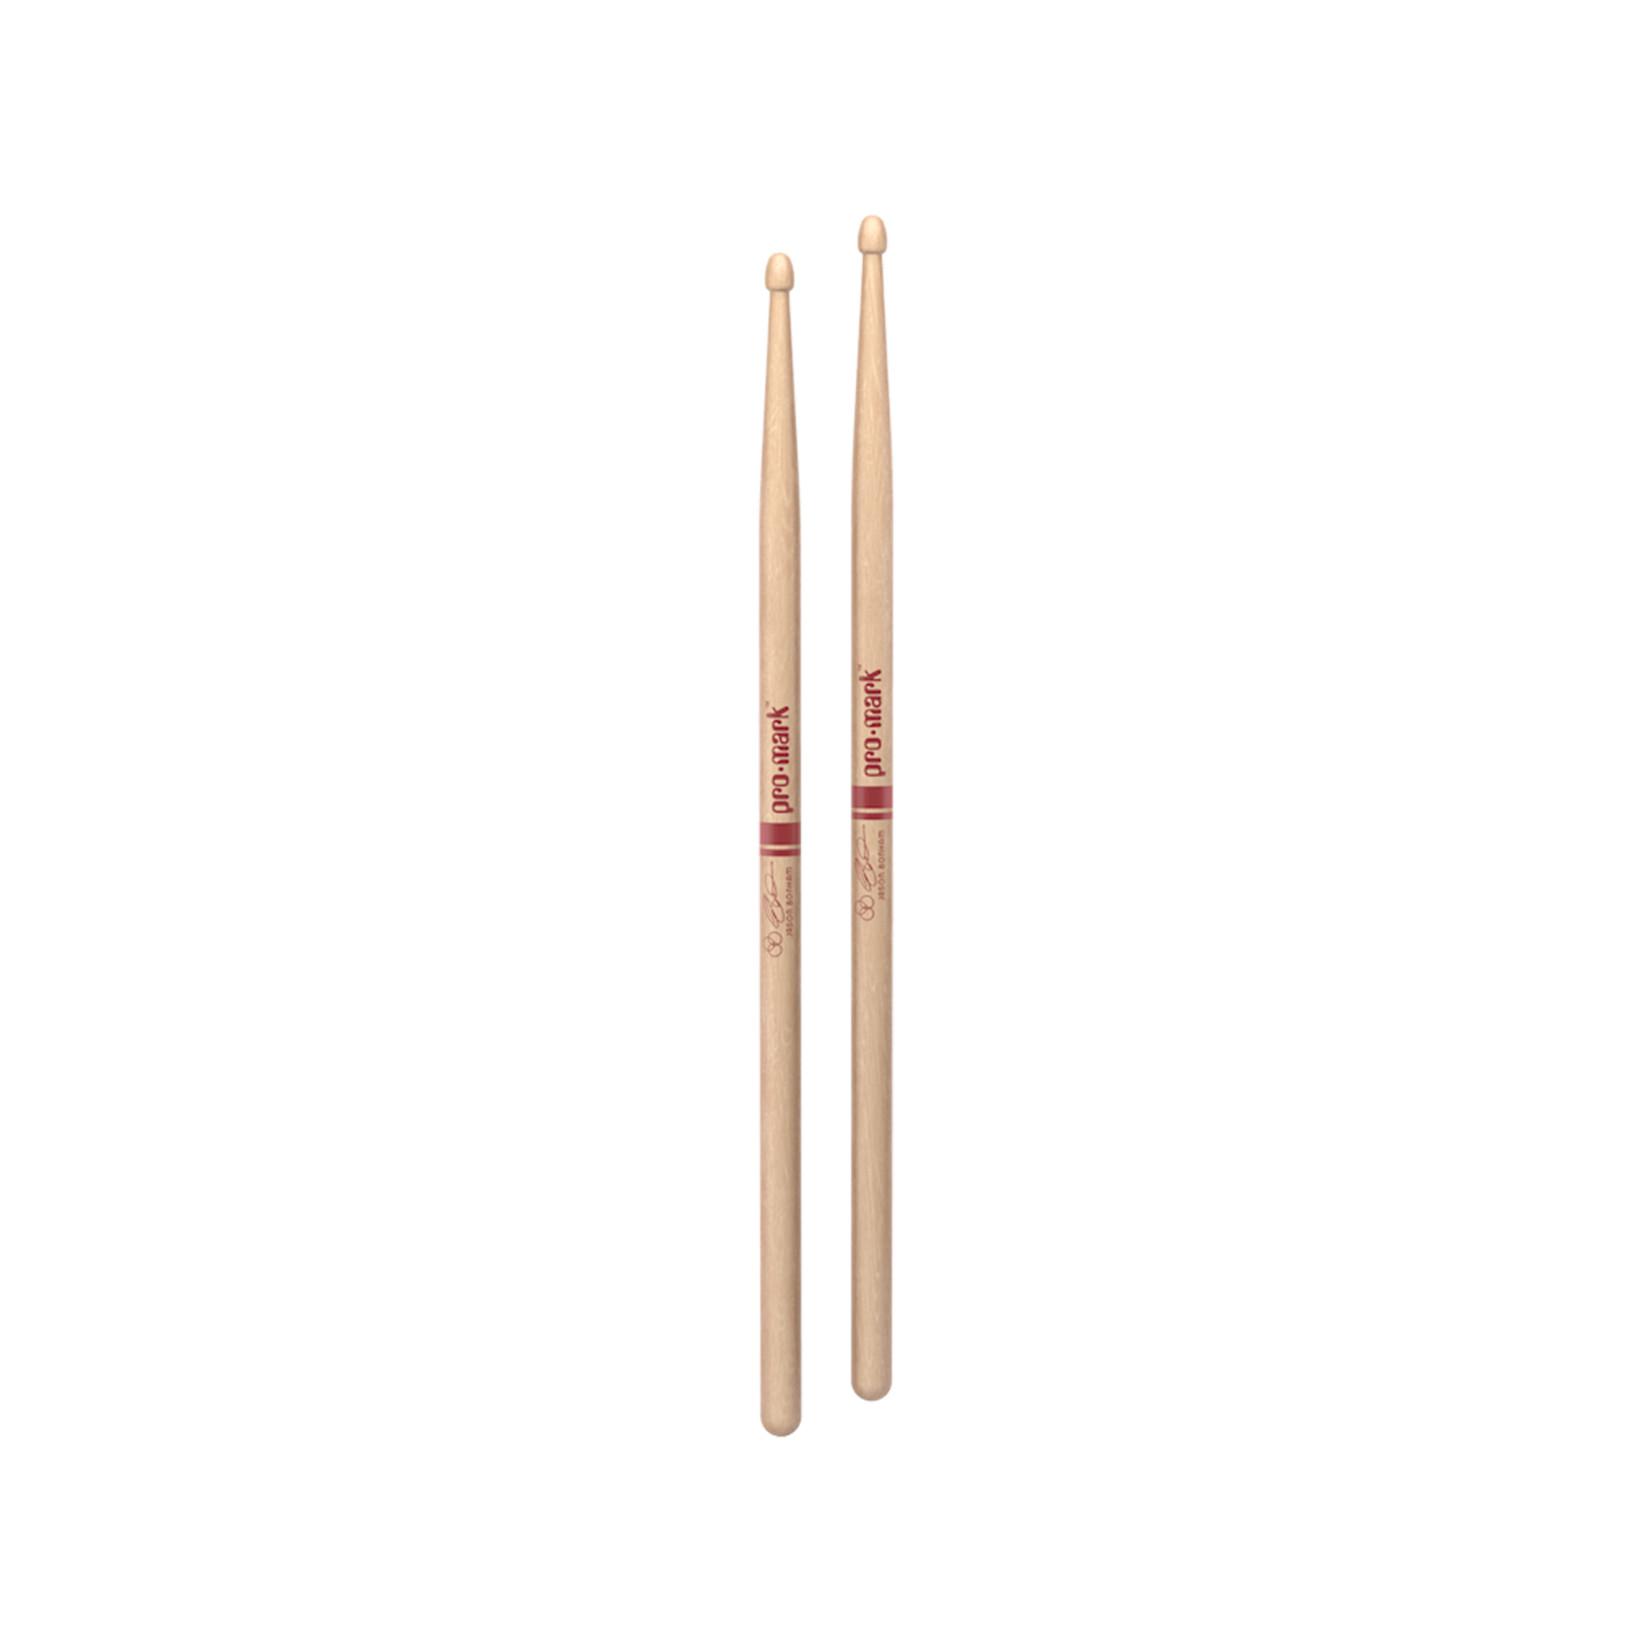 Promark ProMark Jason Bonham SD531 Maple Wood Tip Drumstick